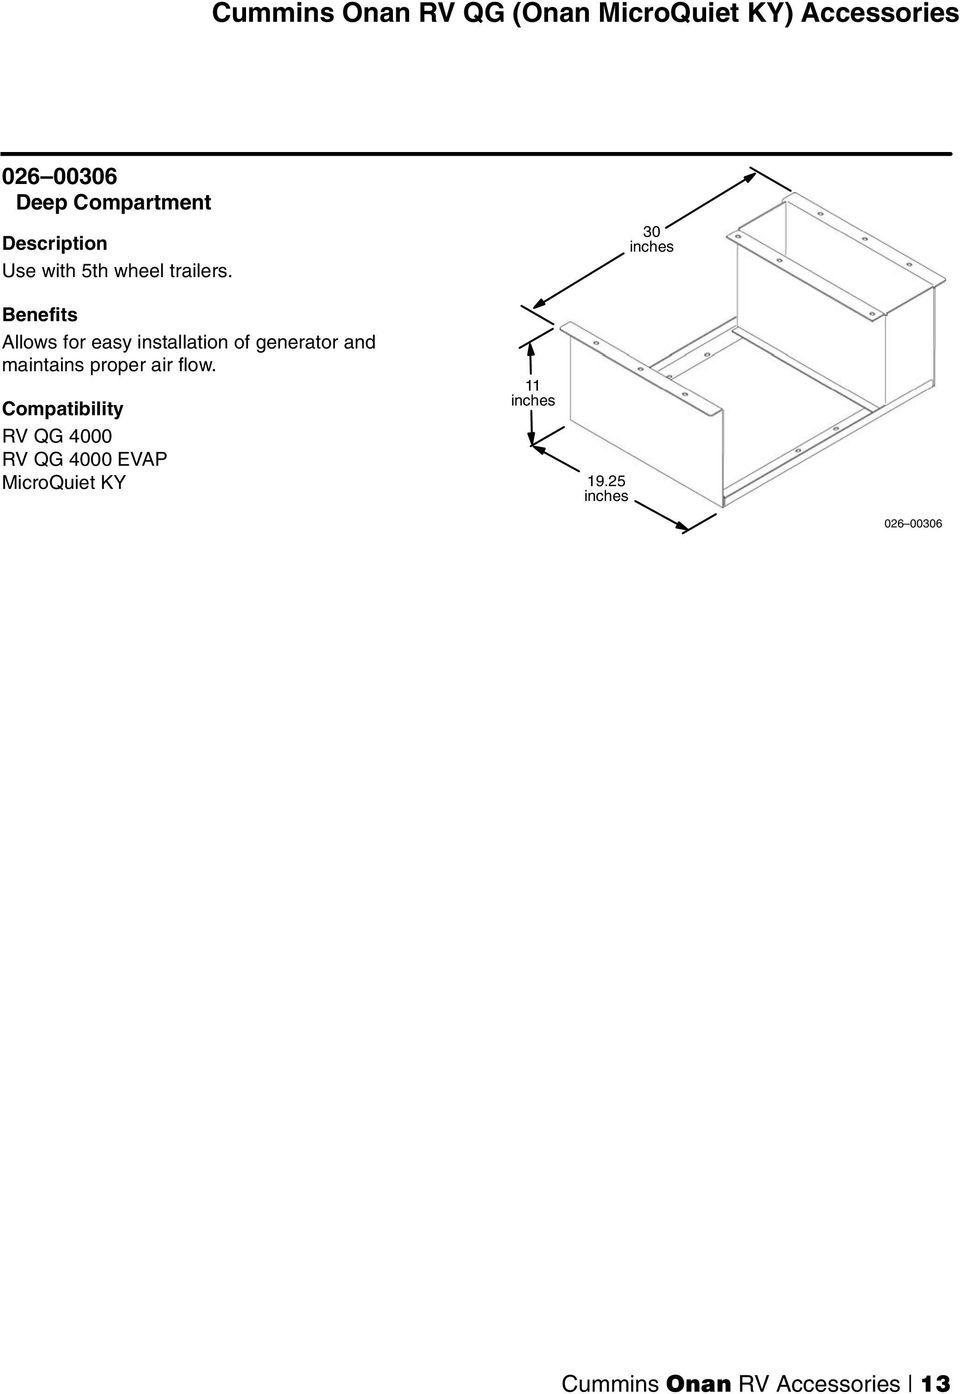 onan microquiet 4000 installation manual